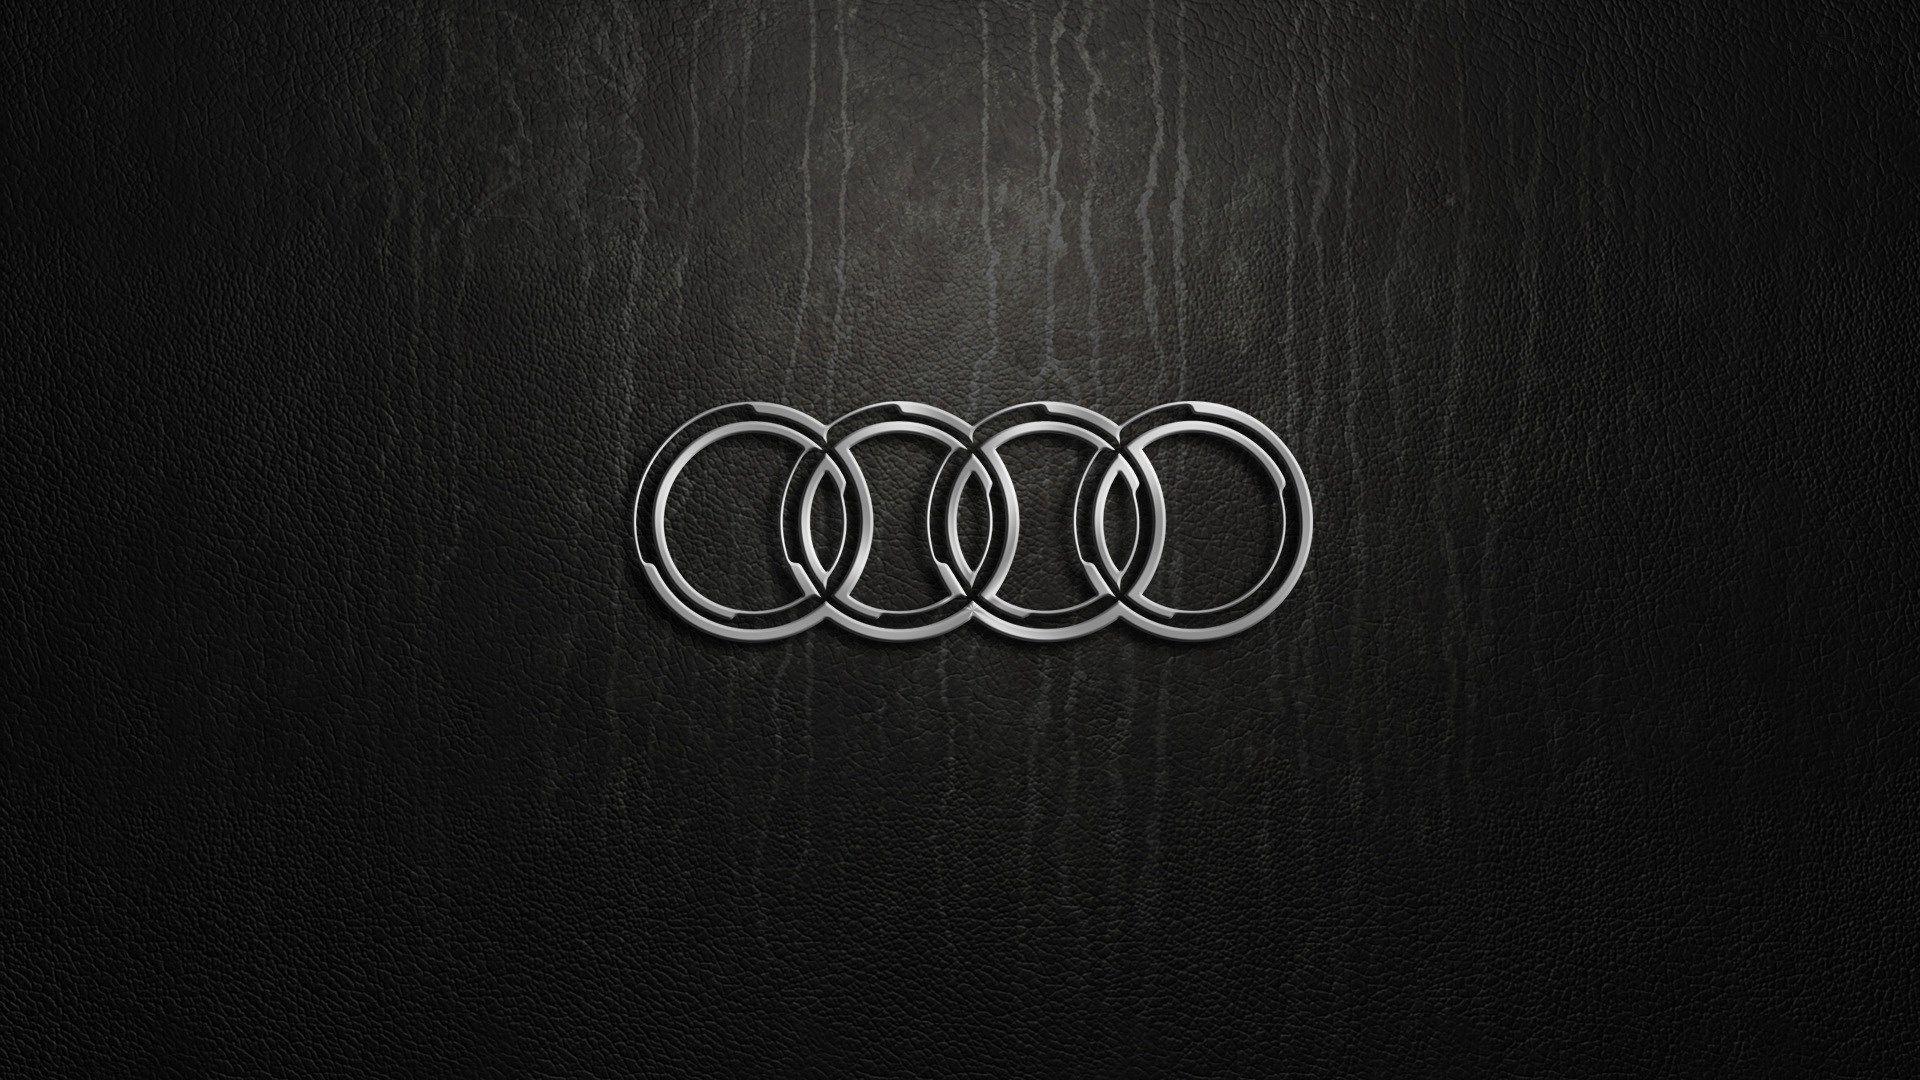 Audi Logo Wallpaper Full Hd Voitures Pinterest Wallpaper